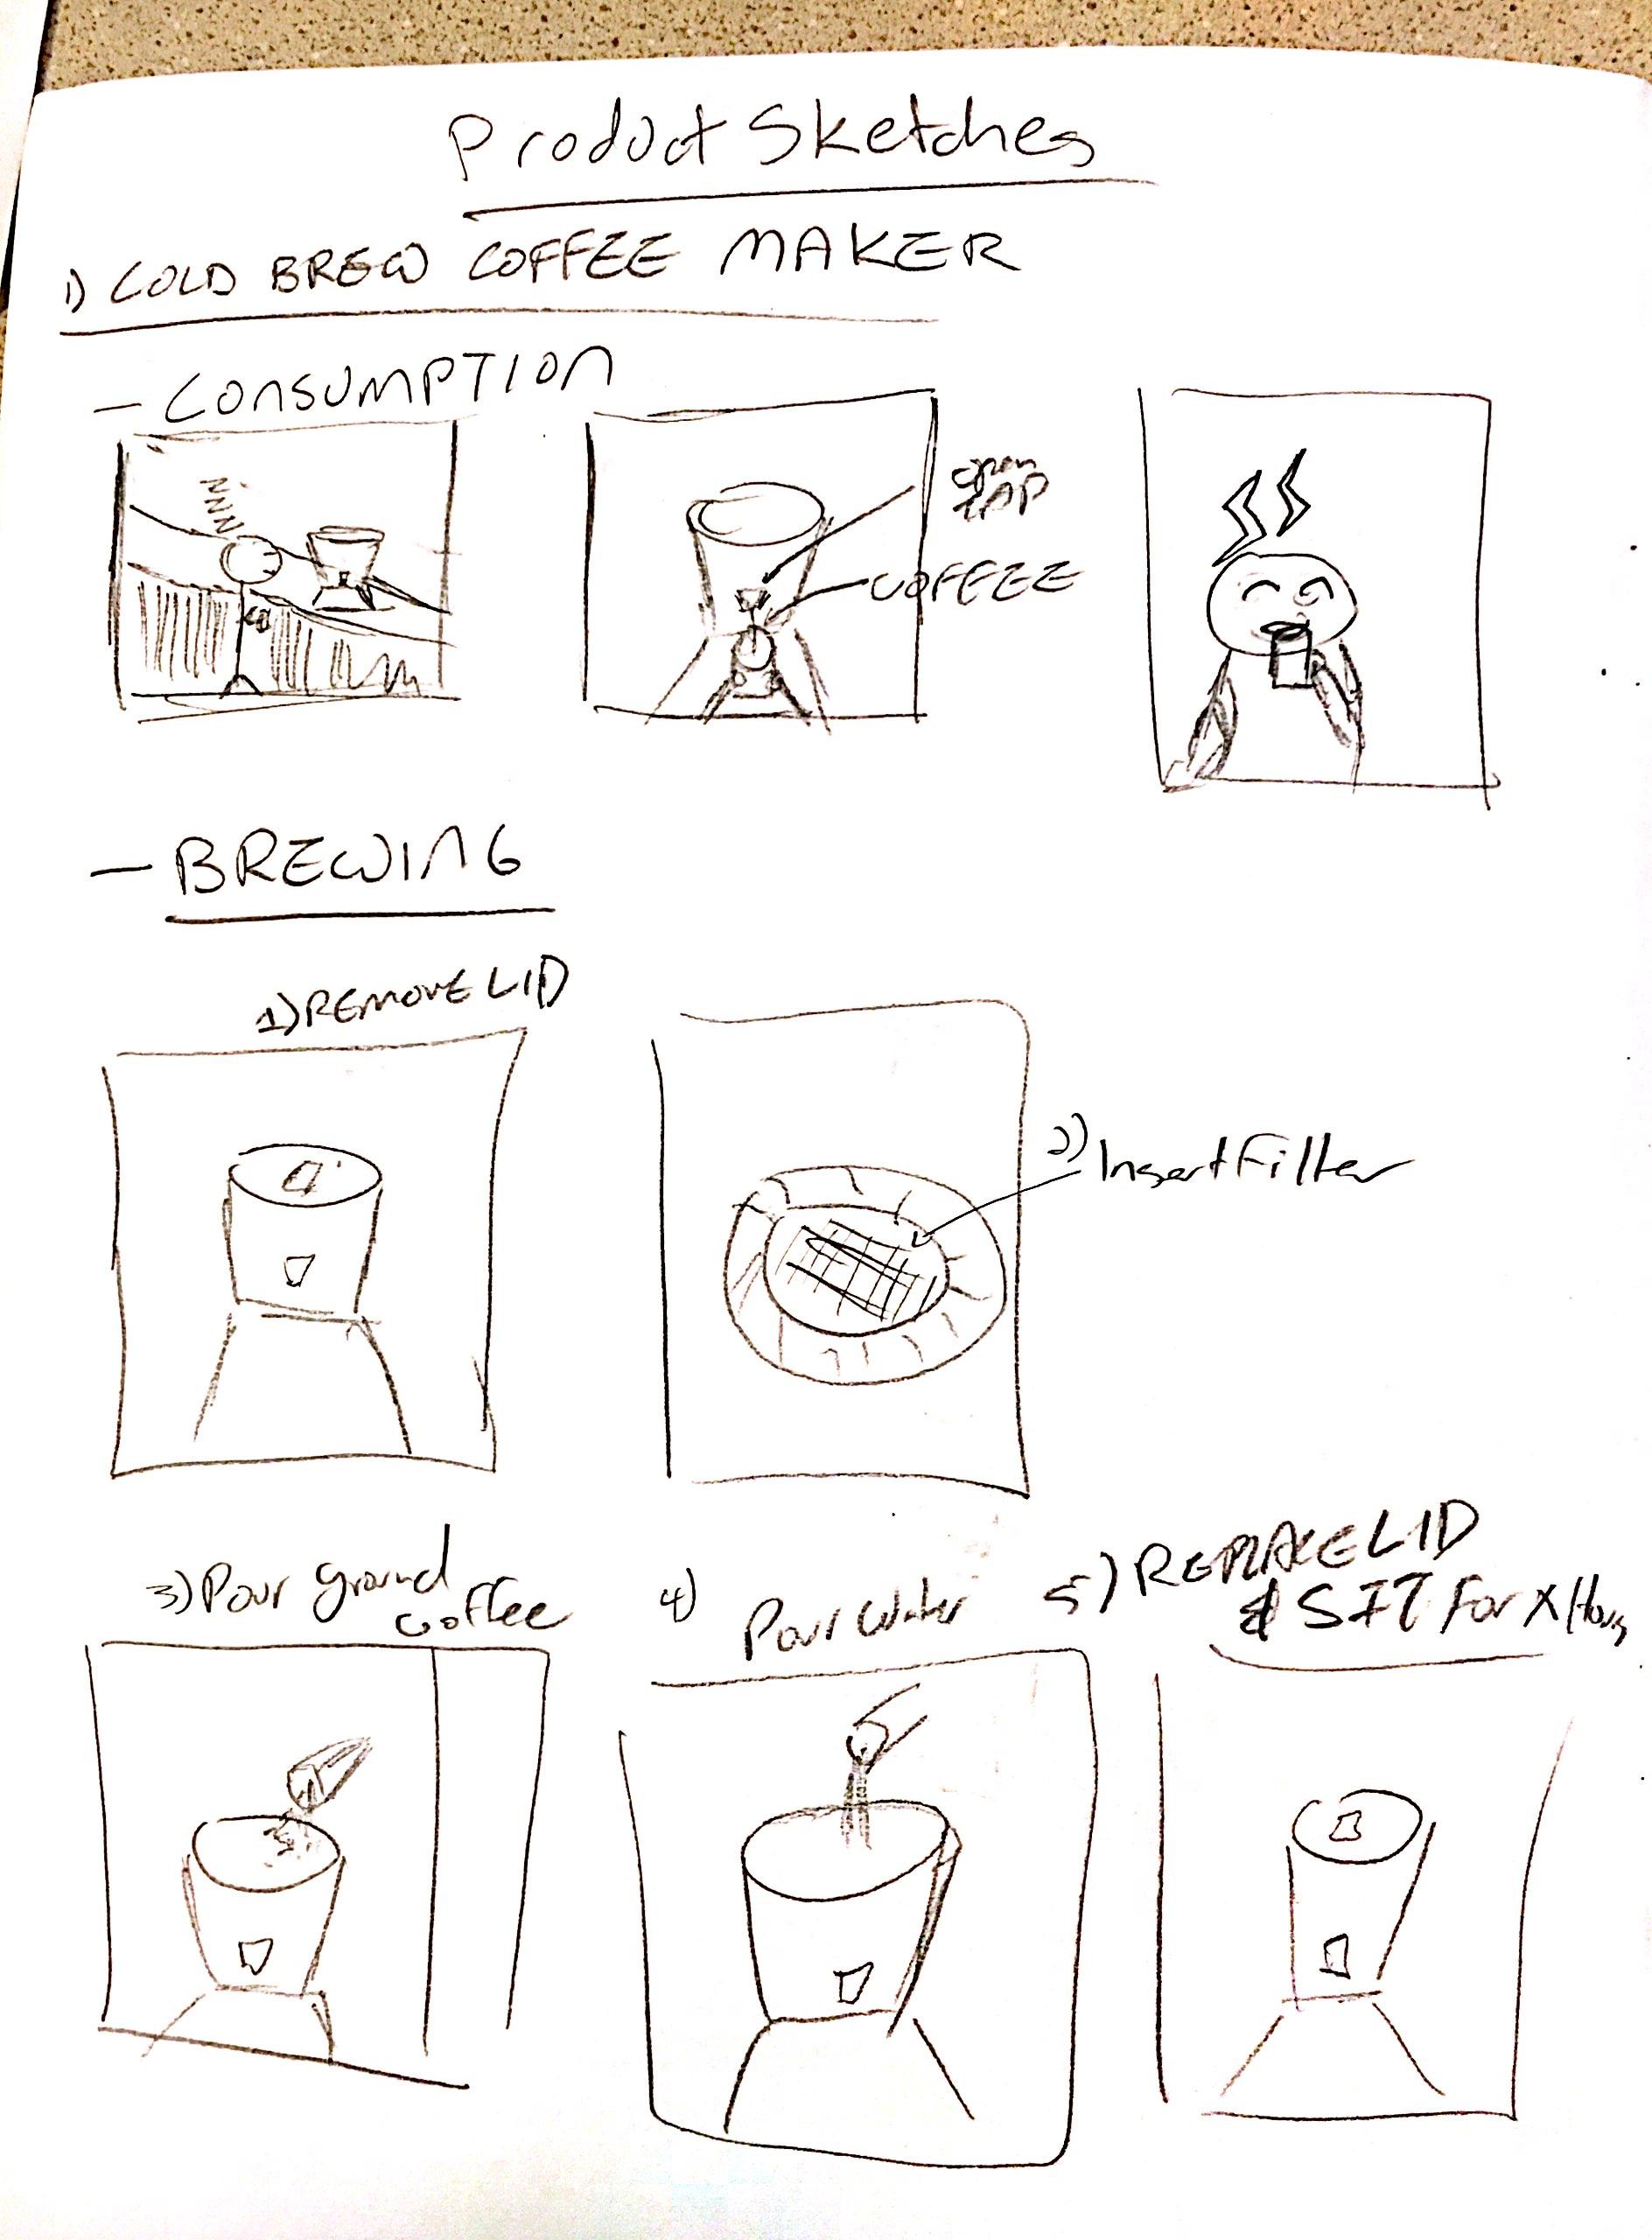 cold_brew_maker (2).jpg